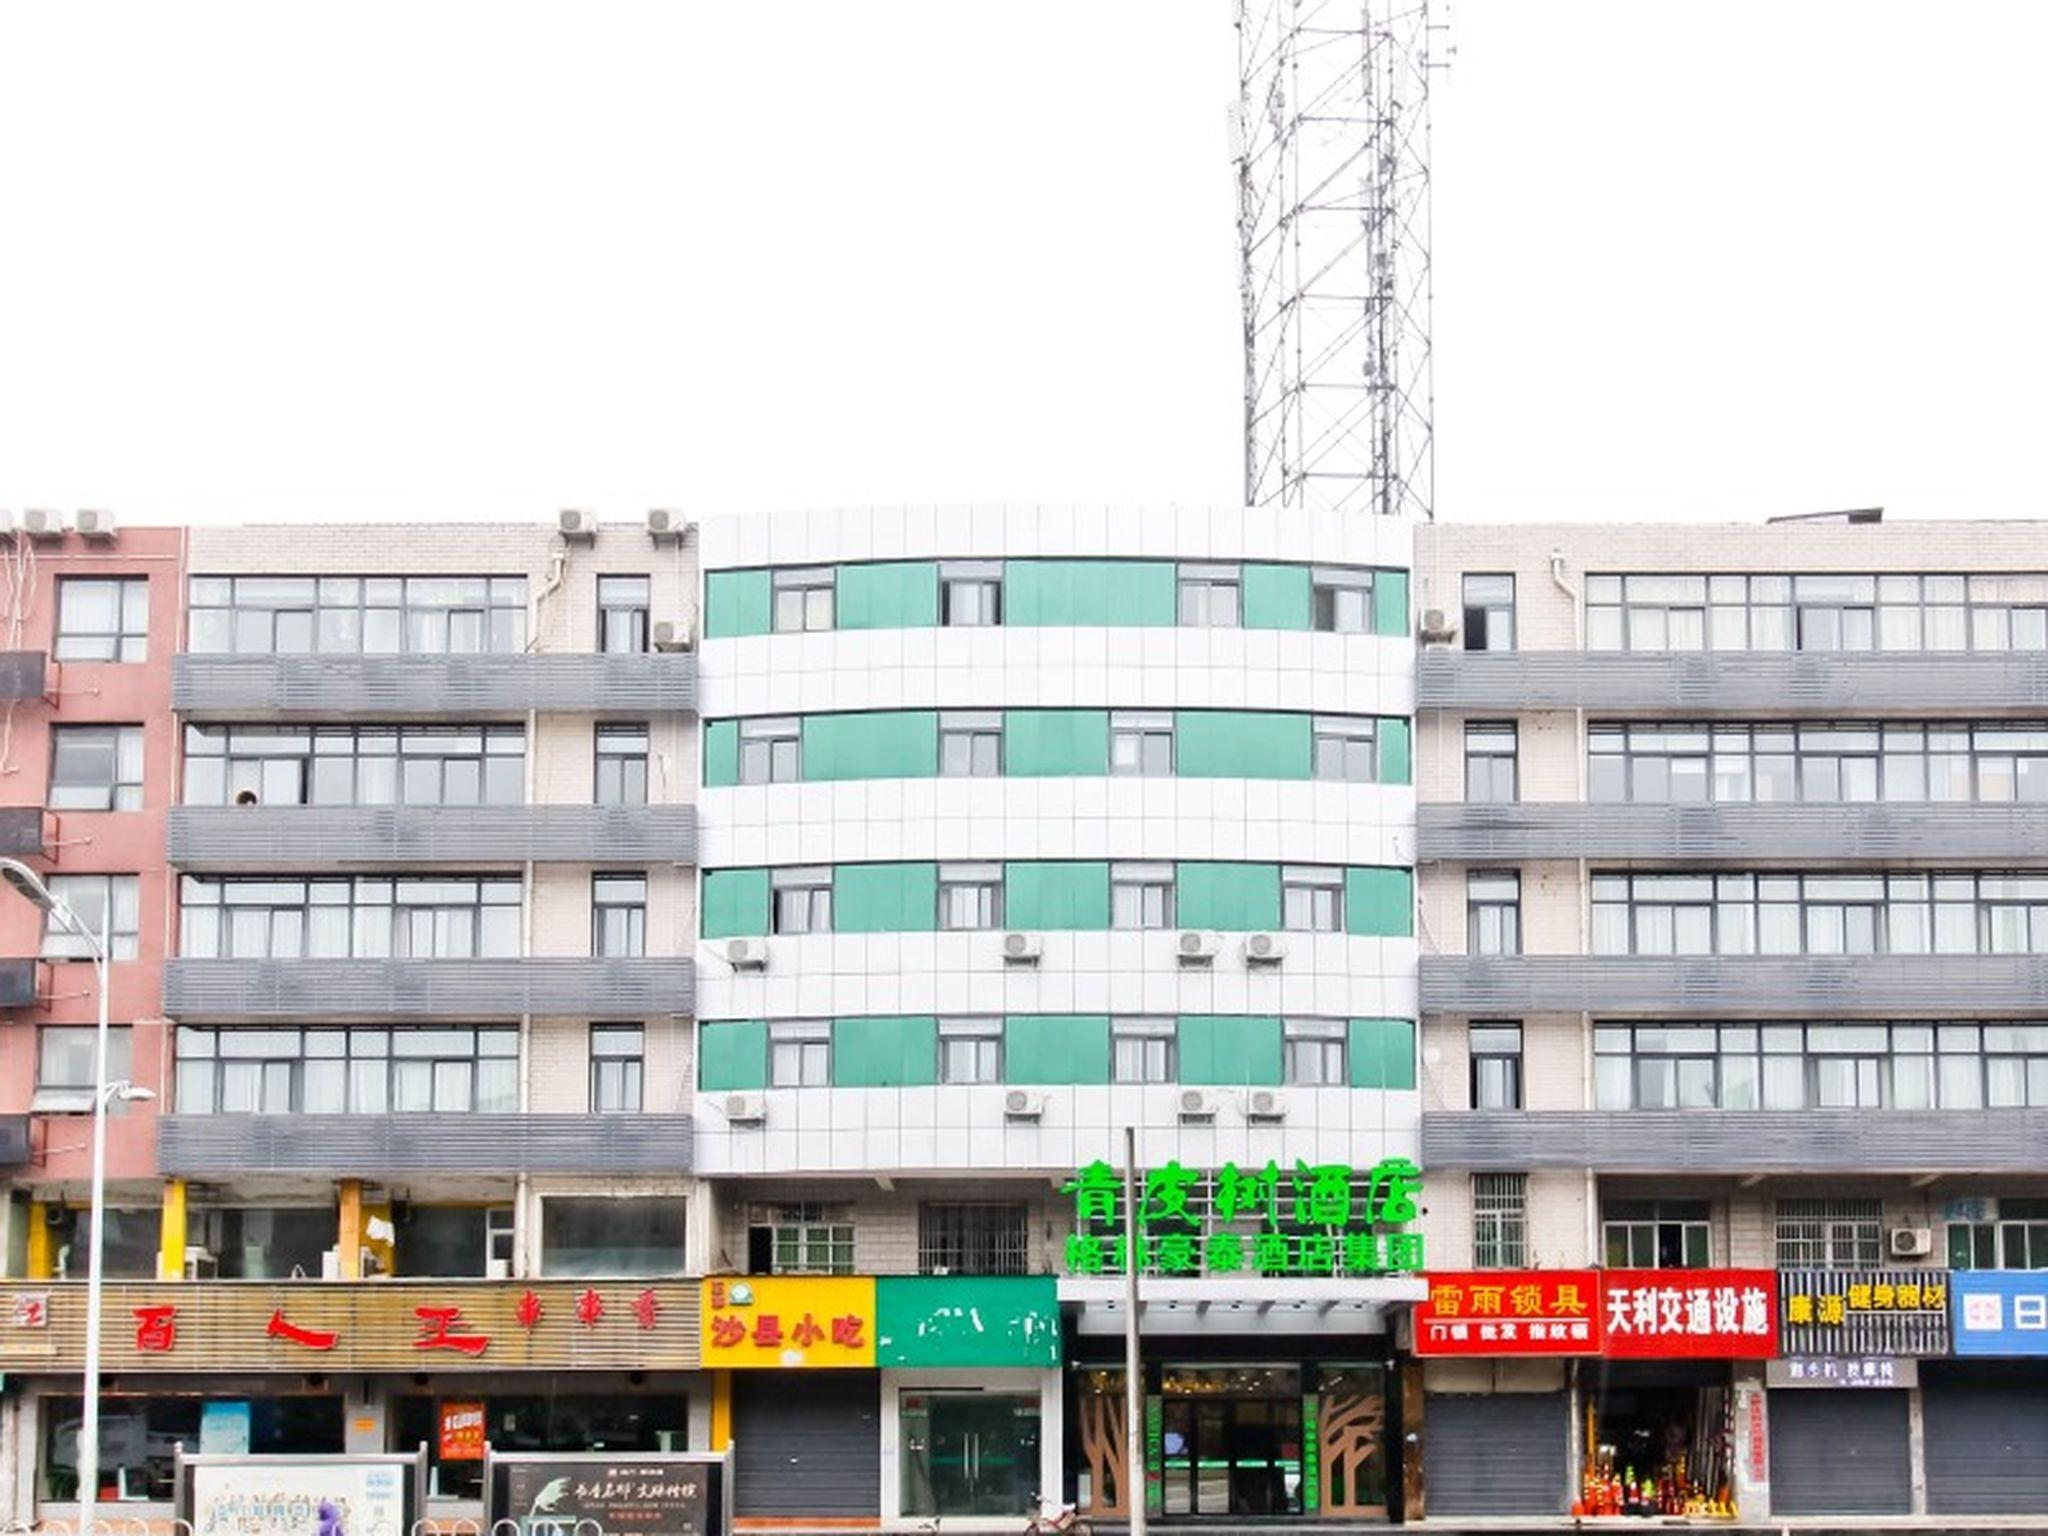 Vatica Hefei Yaohai District Linquan Road Anhui Big Market Hotel